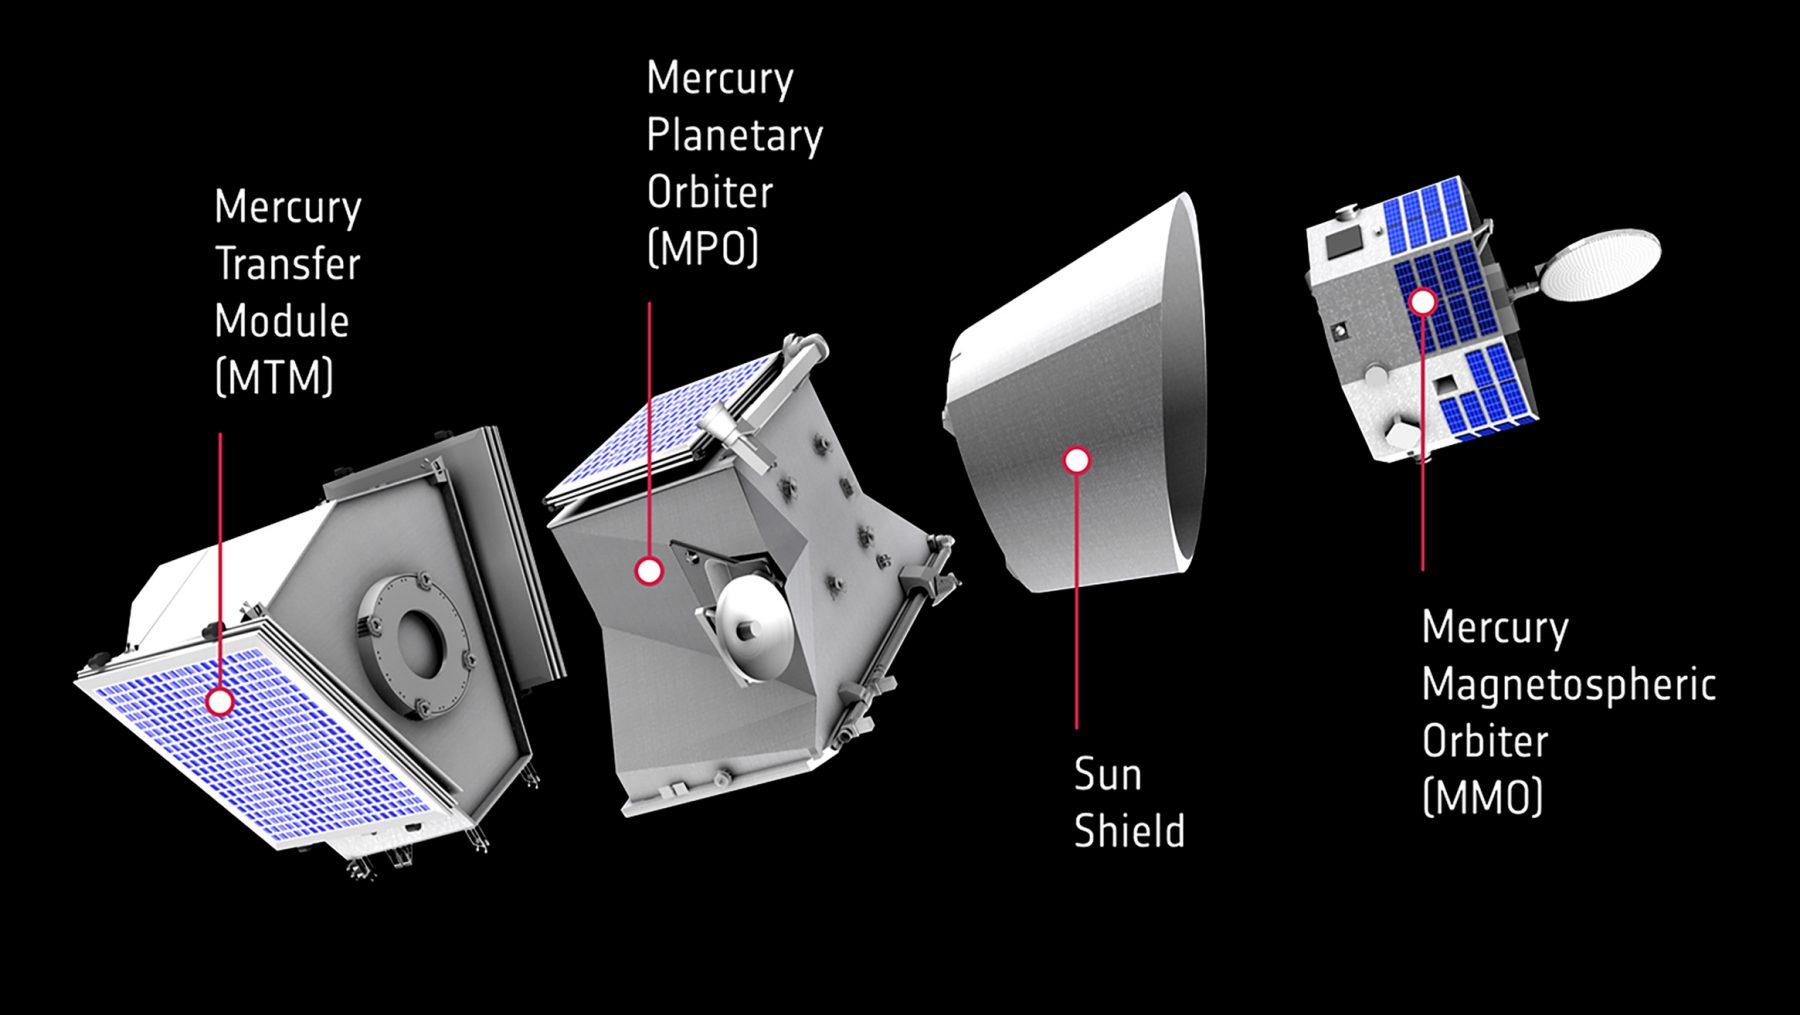 Devices of the BepiColombo mission: flight module, European orbital probe MPO, sun shield, Japanese magnetospheric probe MMO. Credit: ESA